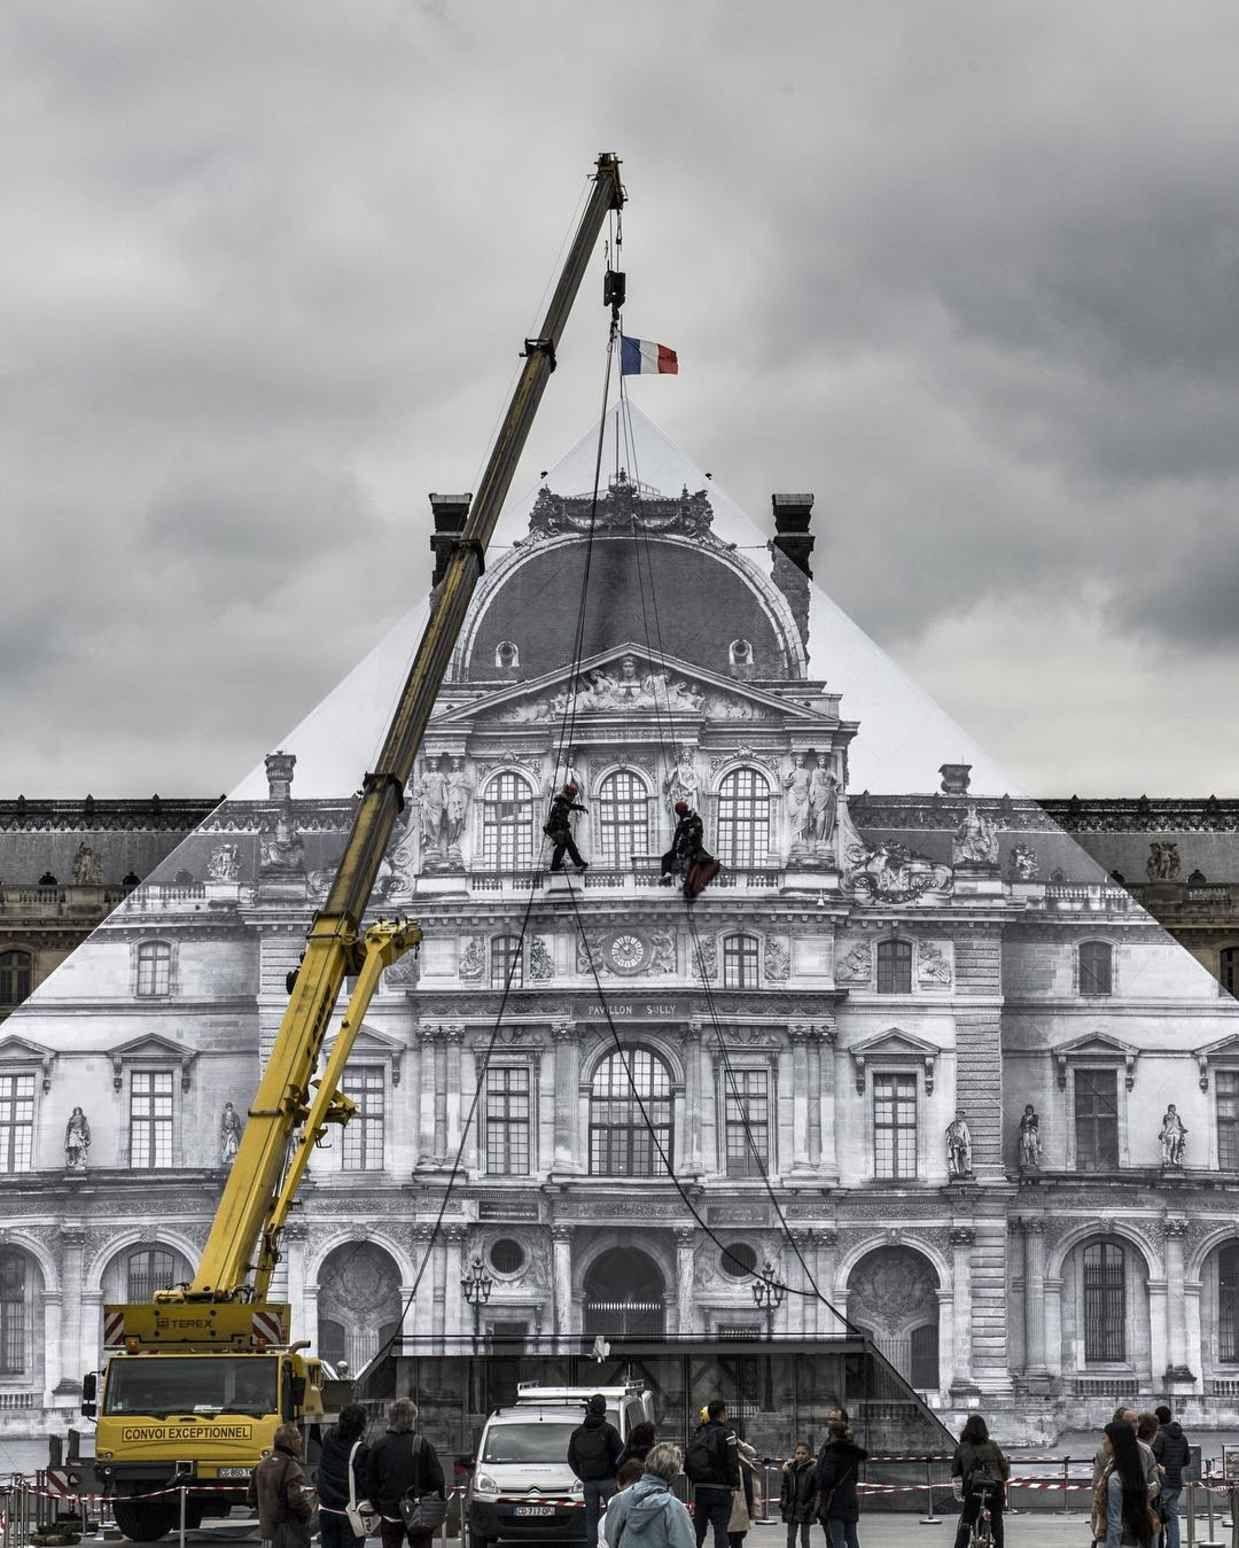 Artist Creates Impressive Illusion to Make Famous Louvre